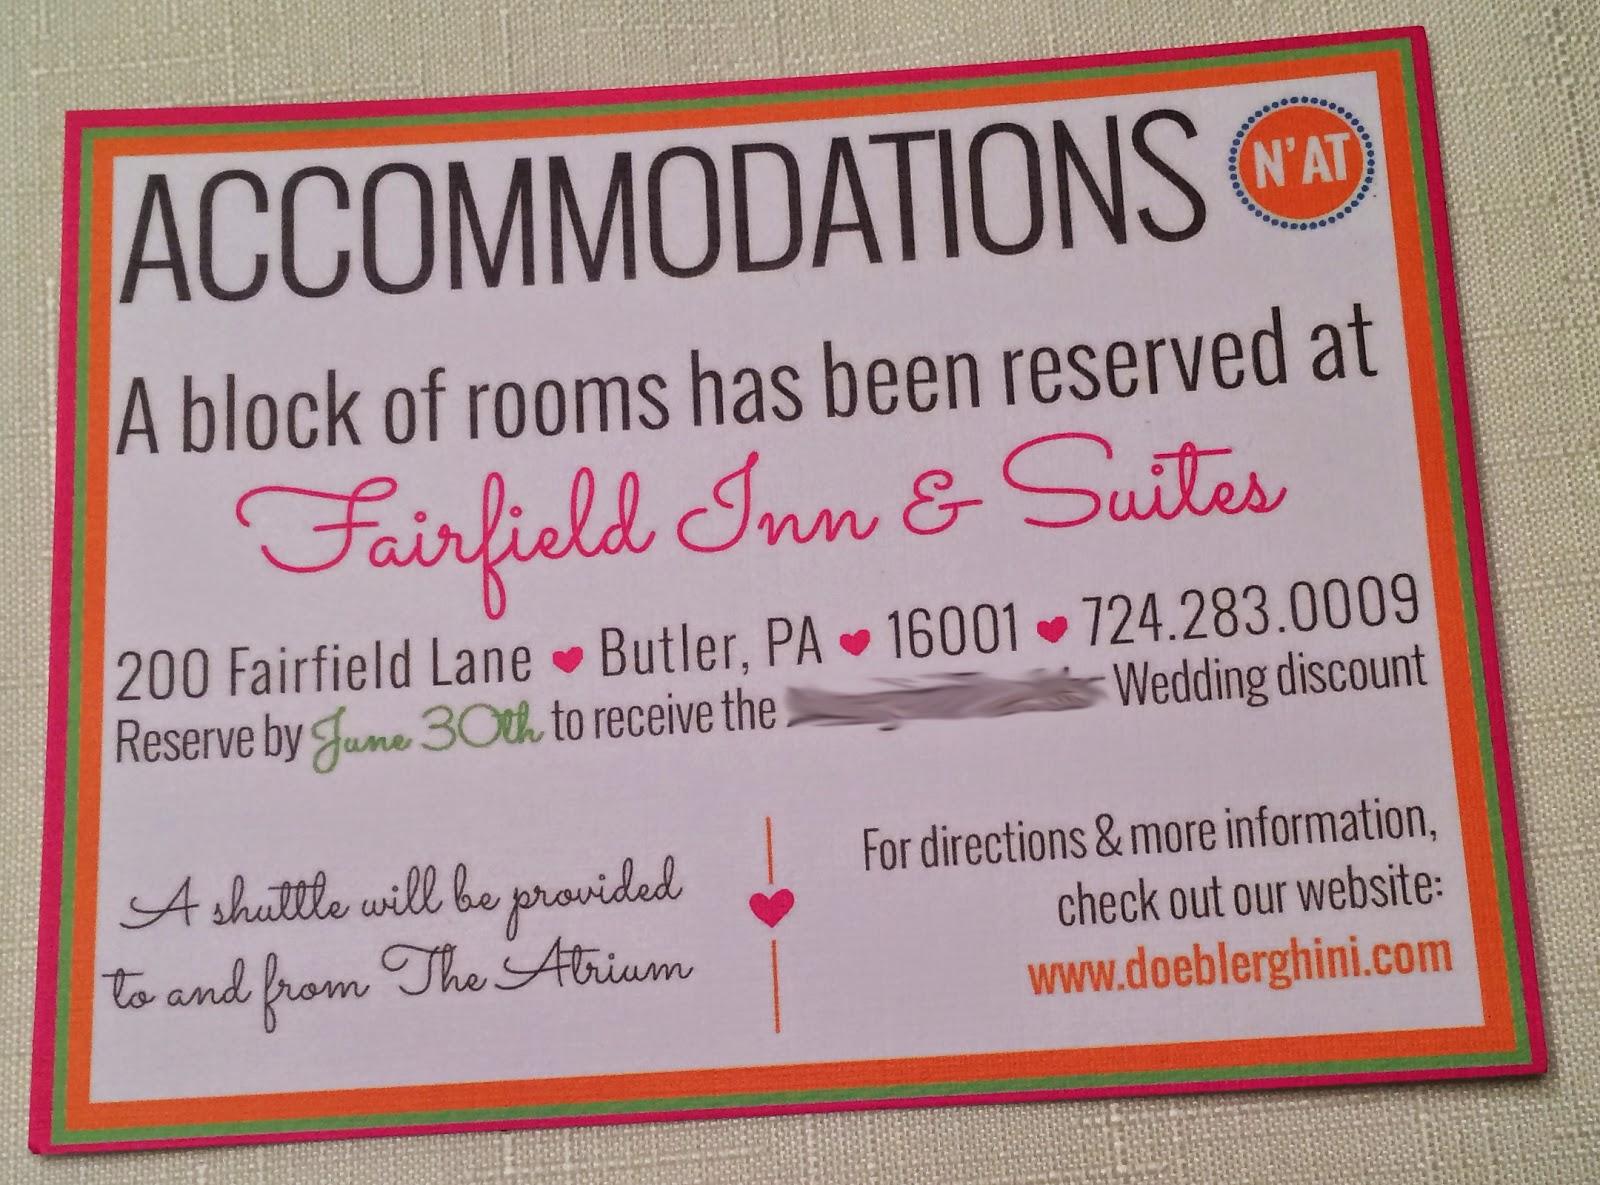 Wedding Invitation Accommodation Insert Wording: The Doeblerghini Bunch: Doeblerghini Wedding Invite Reveal